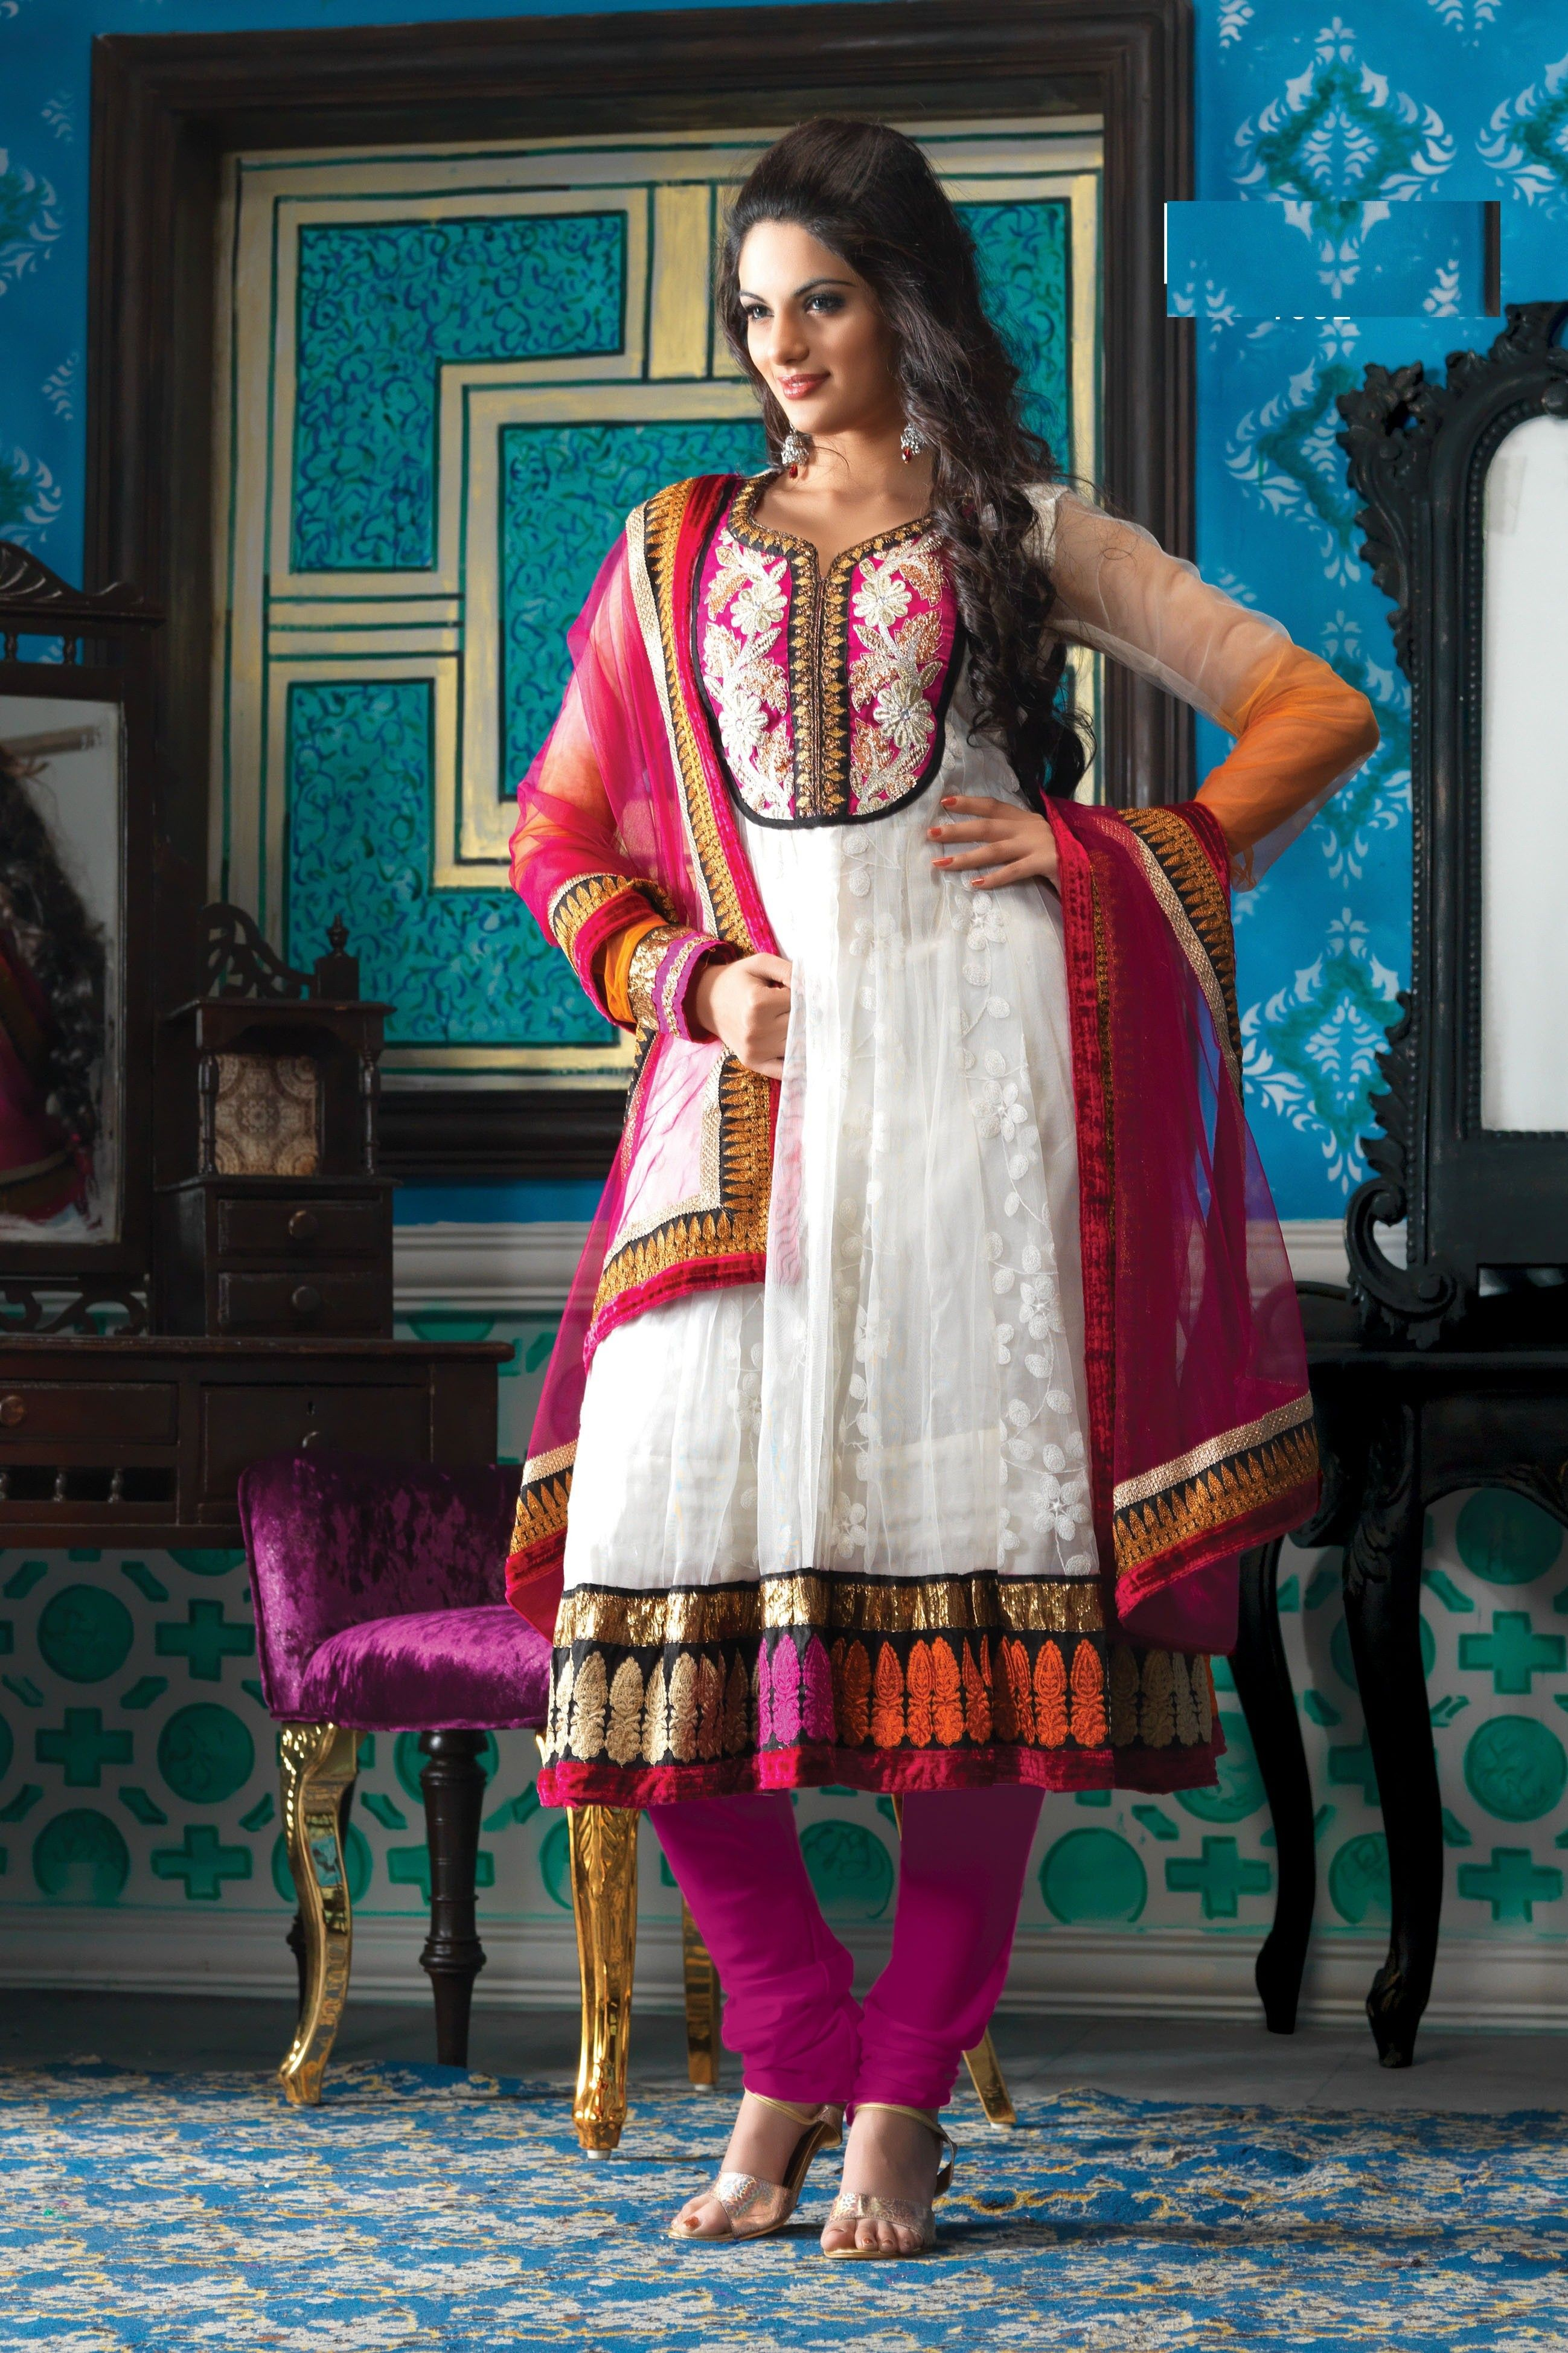 Wholesale Womens Fitness Clothing Manufacturer in USA, China Wholesale fashion clothing india